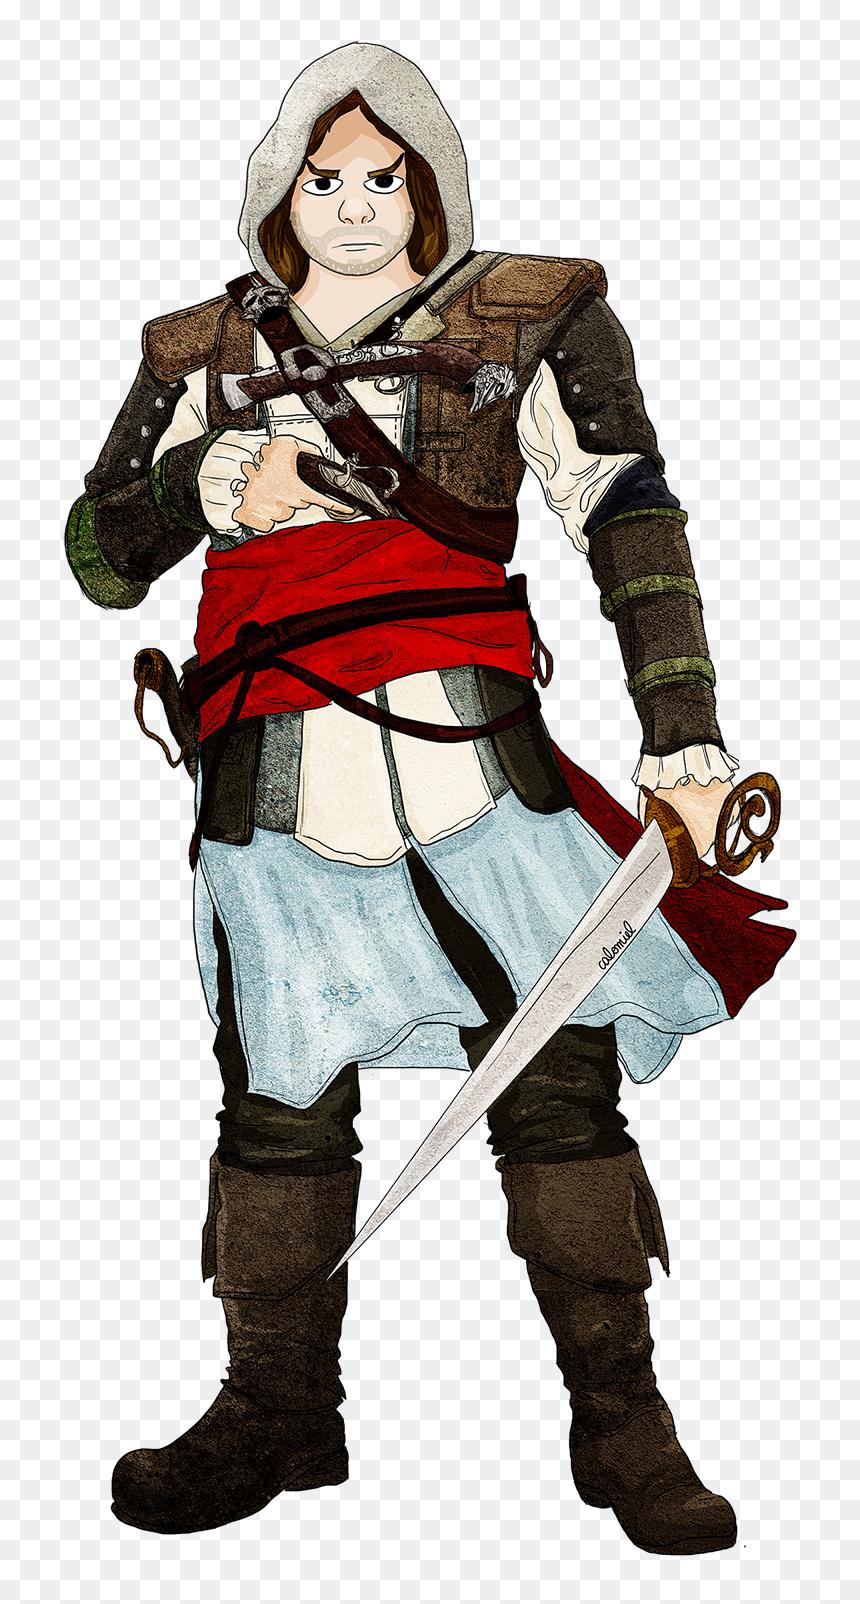 Dessin Assassin S Creed Chibi Edward Kenway Png Download Portable Network Graphics Transparent Png Vhv